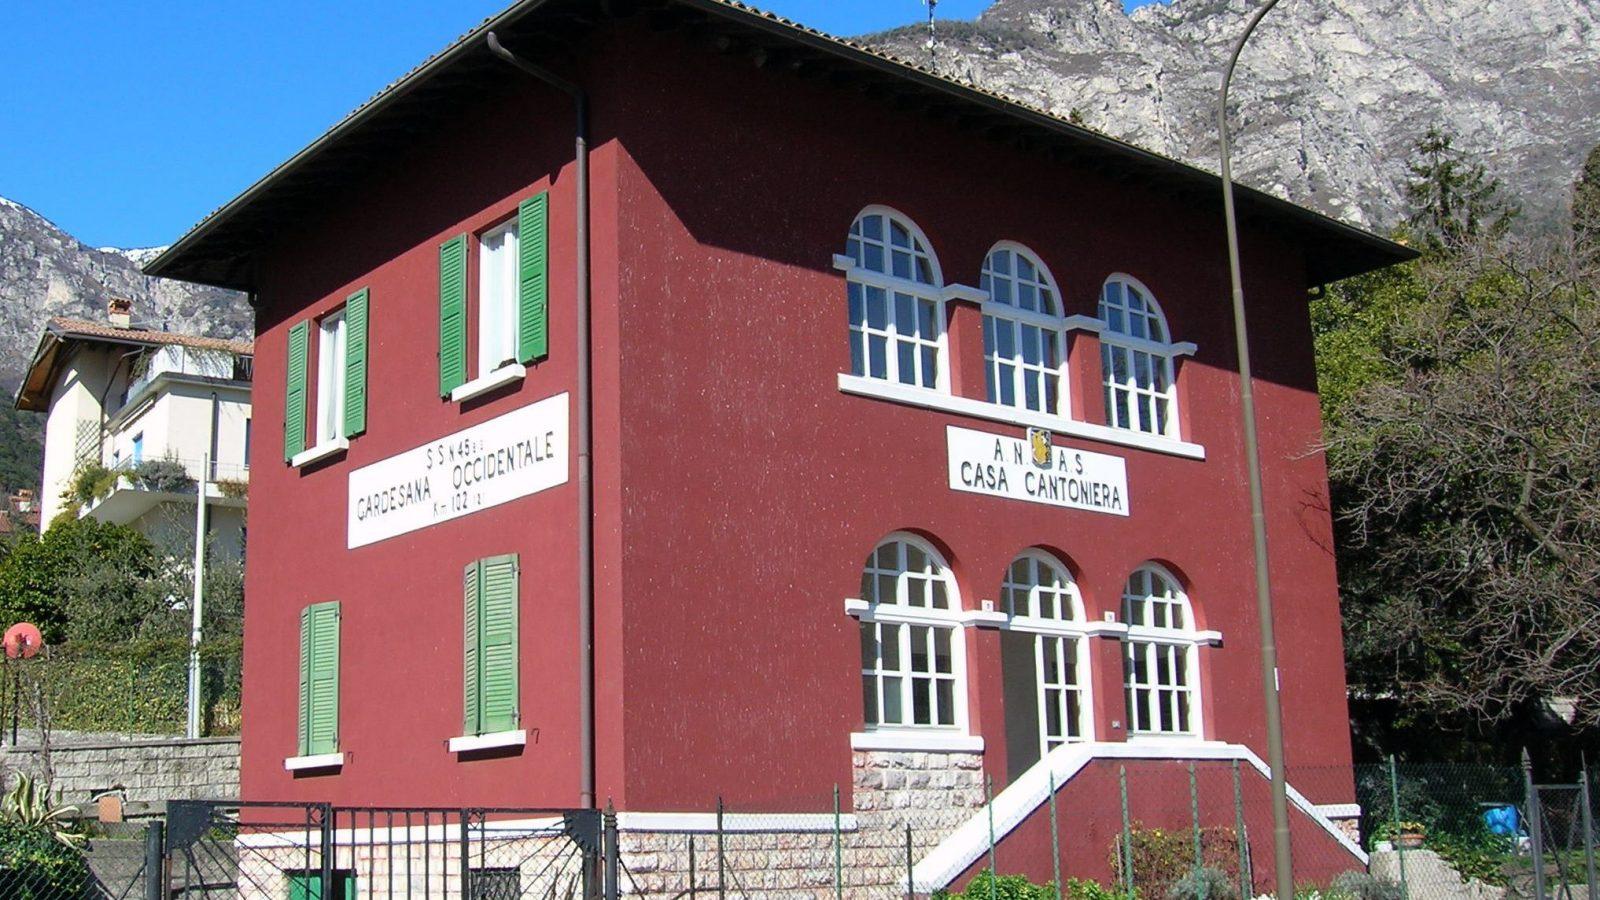 Lombardia, SS45 bis, casa cantoniera di Limone sul Garda (Archivio storico Anas)